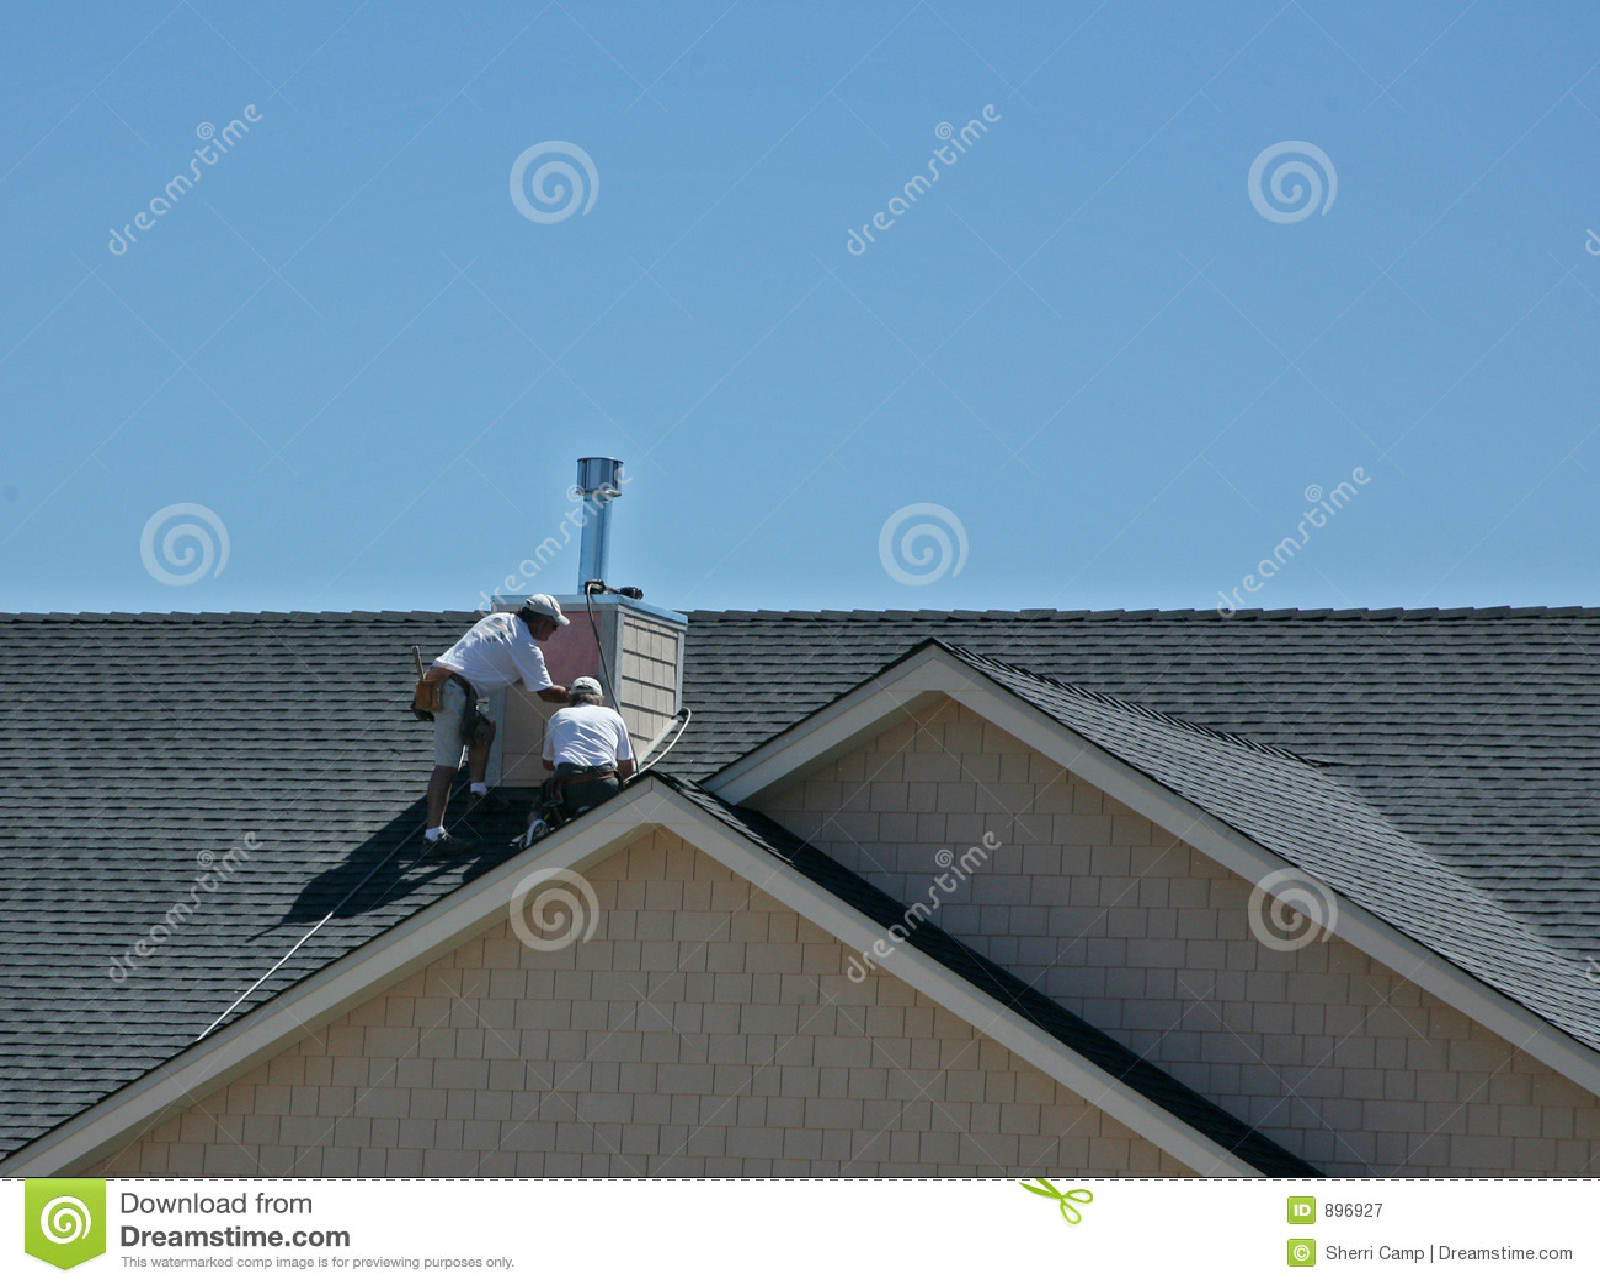 Men Working On Roof Stock Image Image Of Chimney Peaks